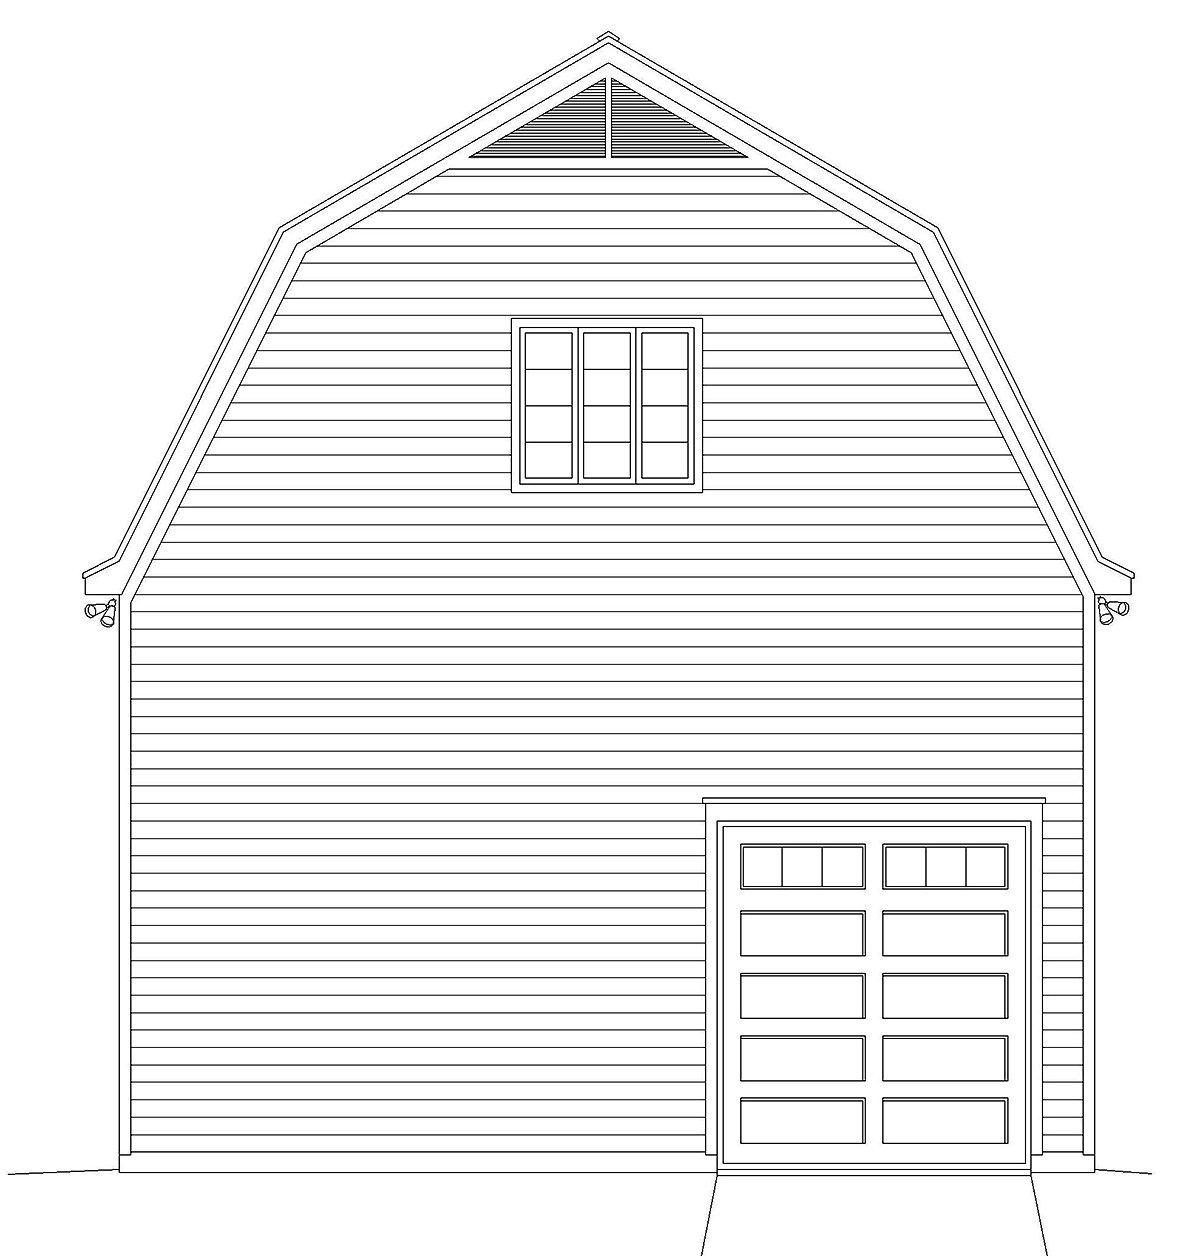 Cottage, Country 4 Car Garage Plan 40885 Rear Elevation